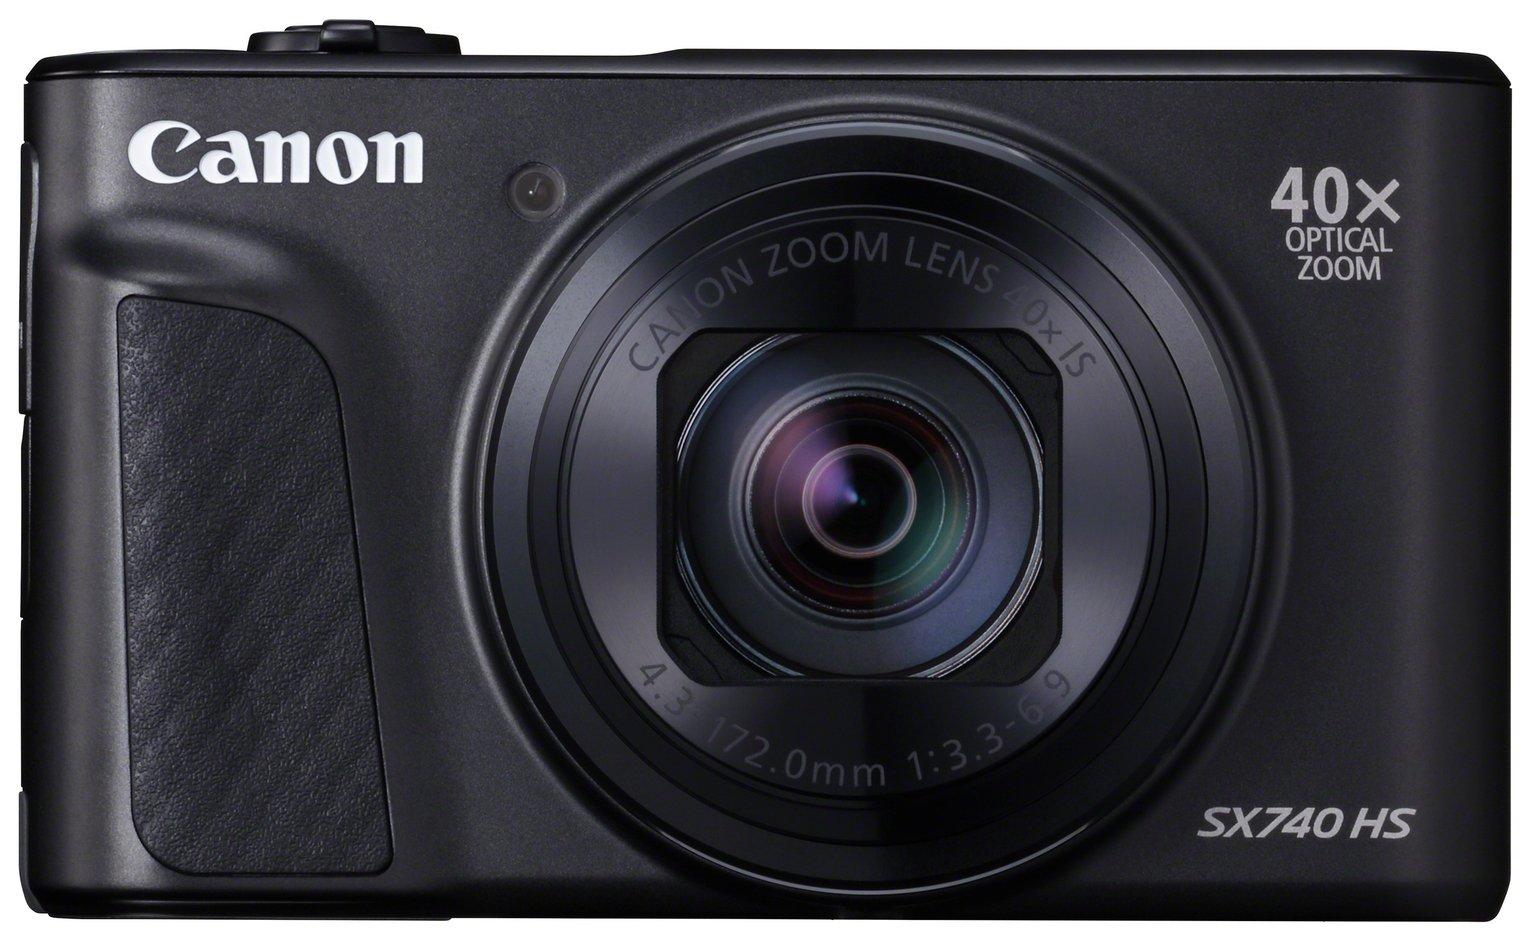 Canon PowerShot SX740 HS 20.3MP 40x Zoom Camera - Black